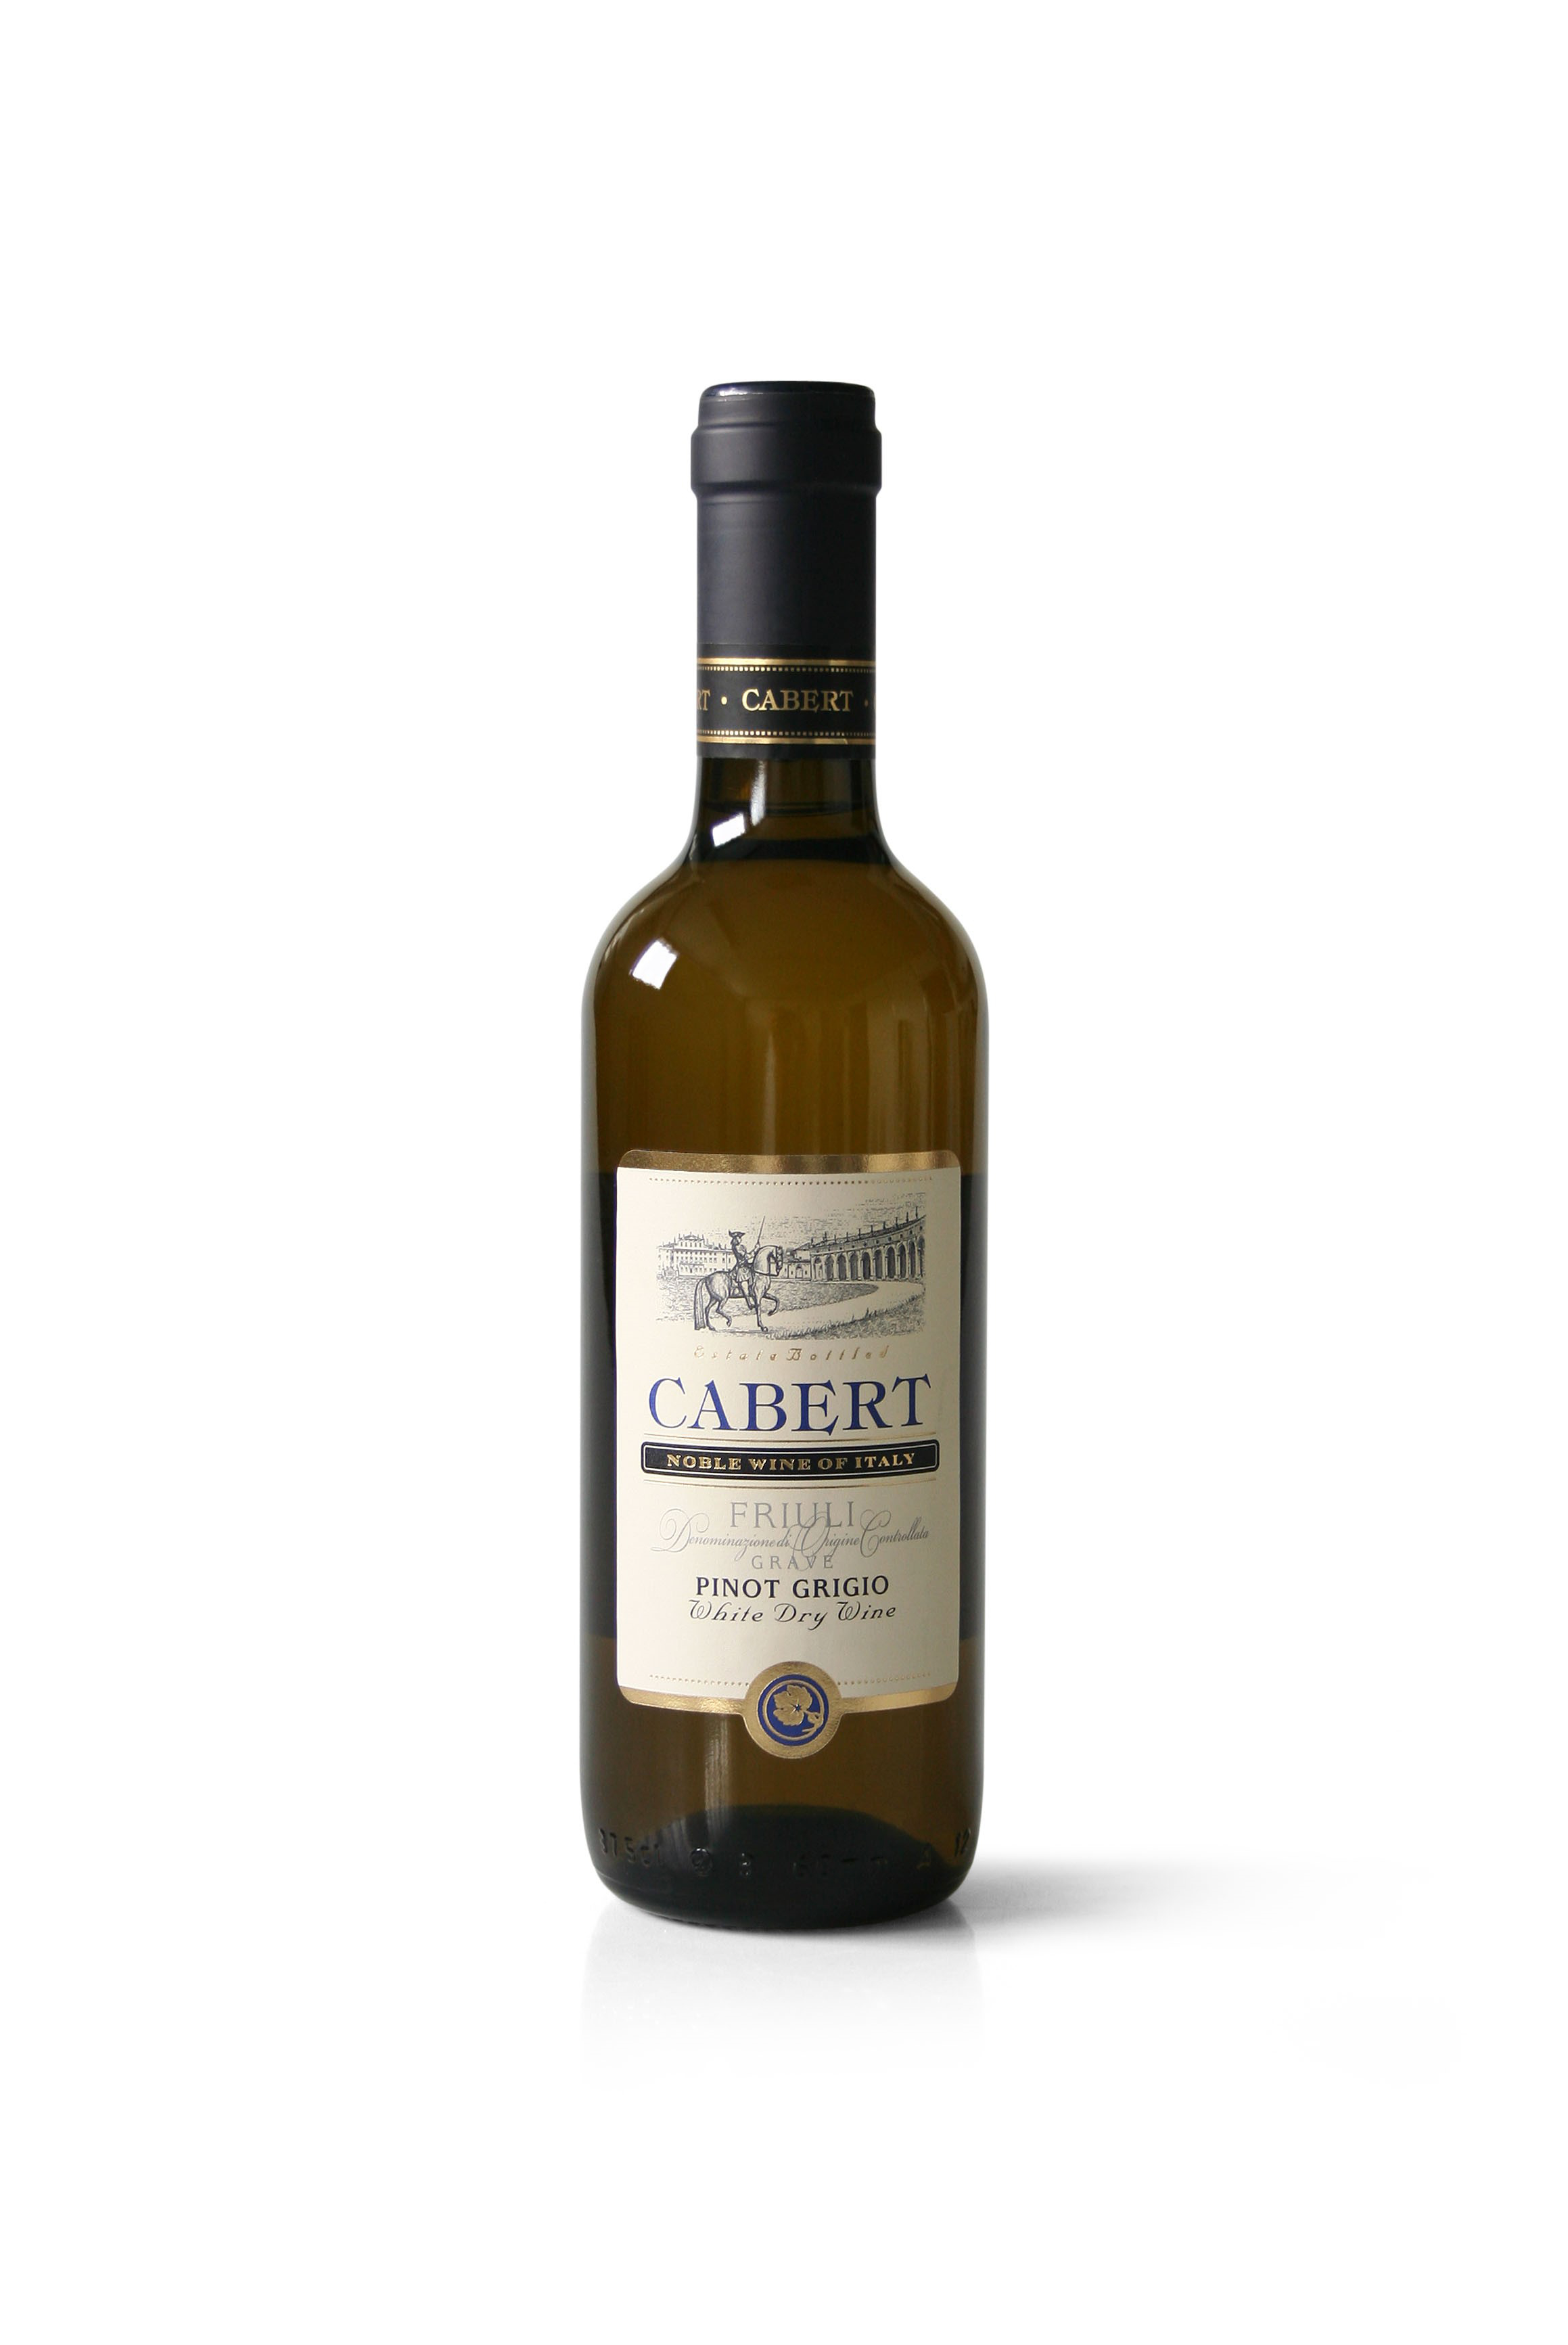 Bertiolo Pinot Grigio Cabert DOP 375ml